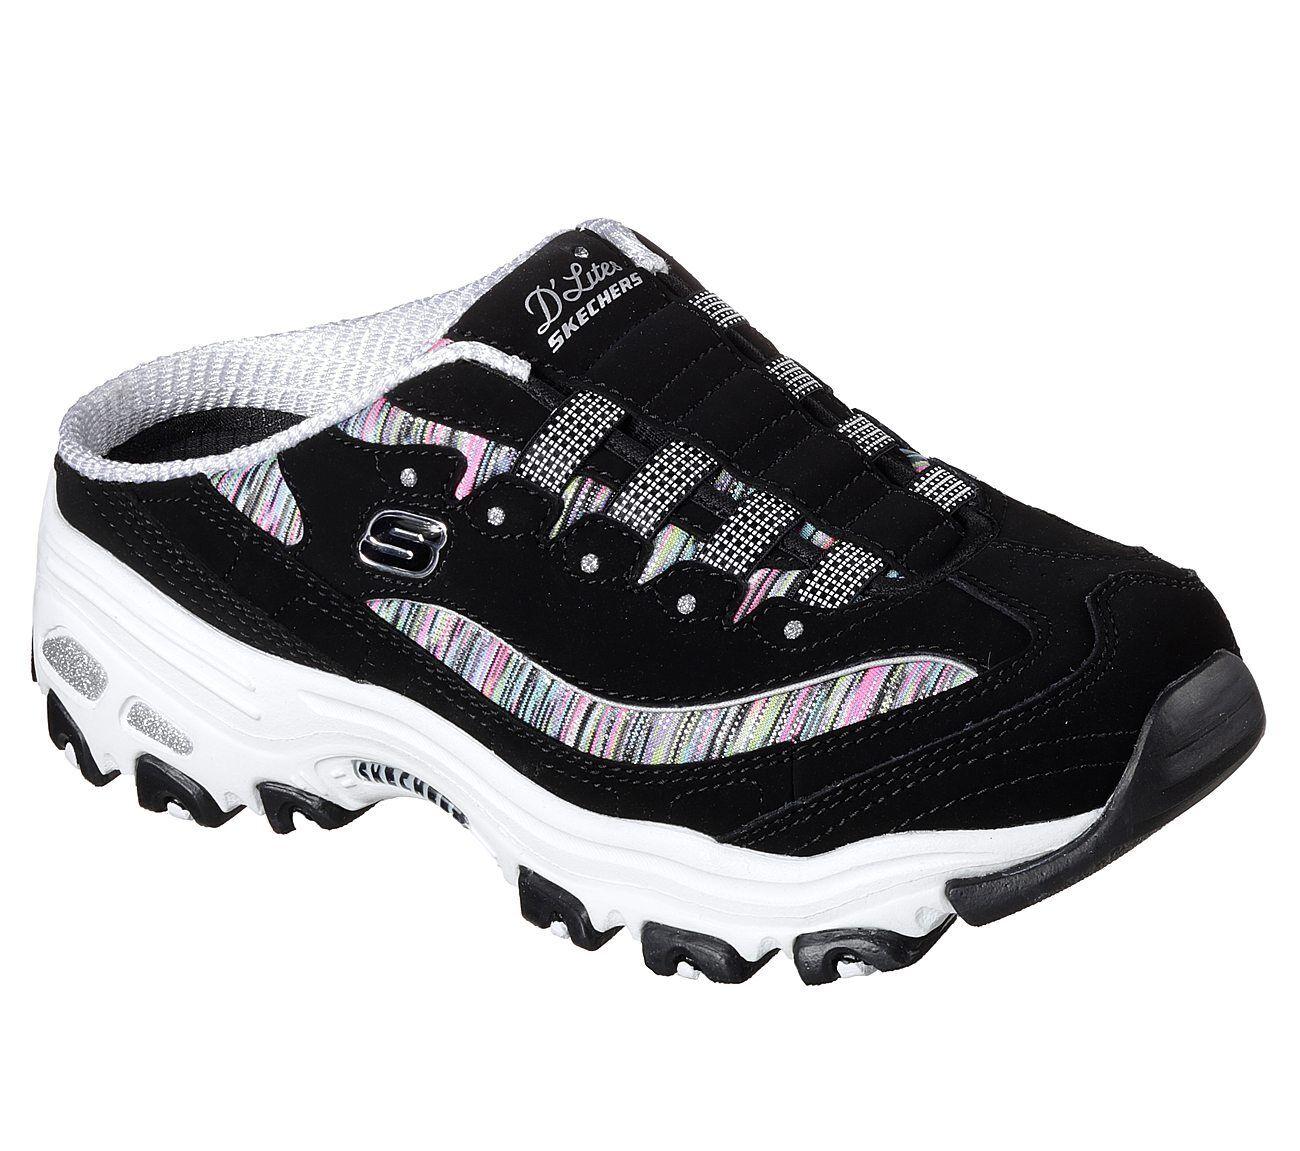 NEU SKECHERS Damen Slipper INTEREST Sneaker Memory Foam D'LITES-SPARK INTEREST Slipper Schwarz 4b65f0